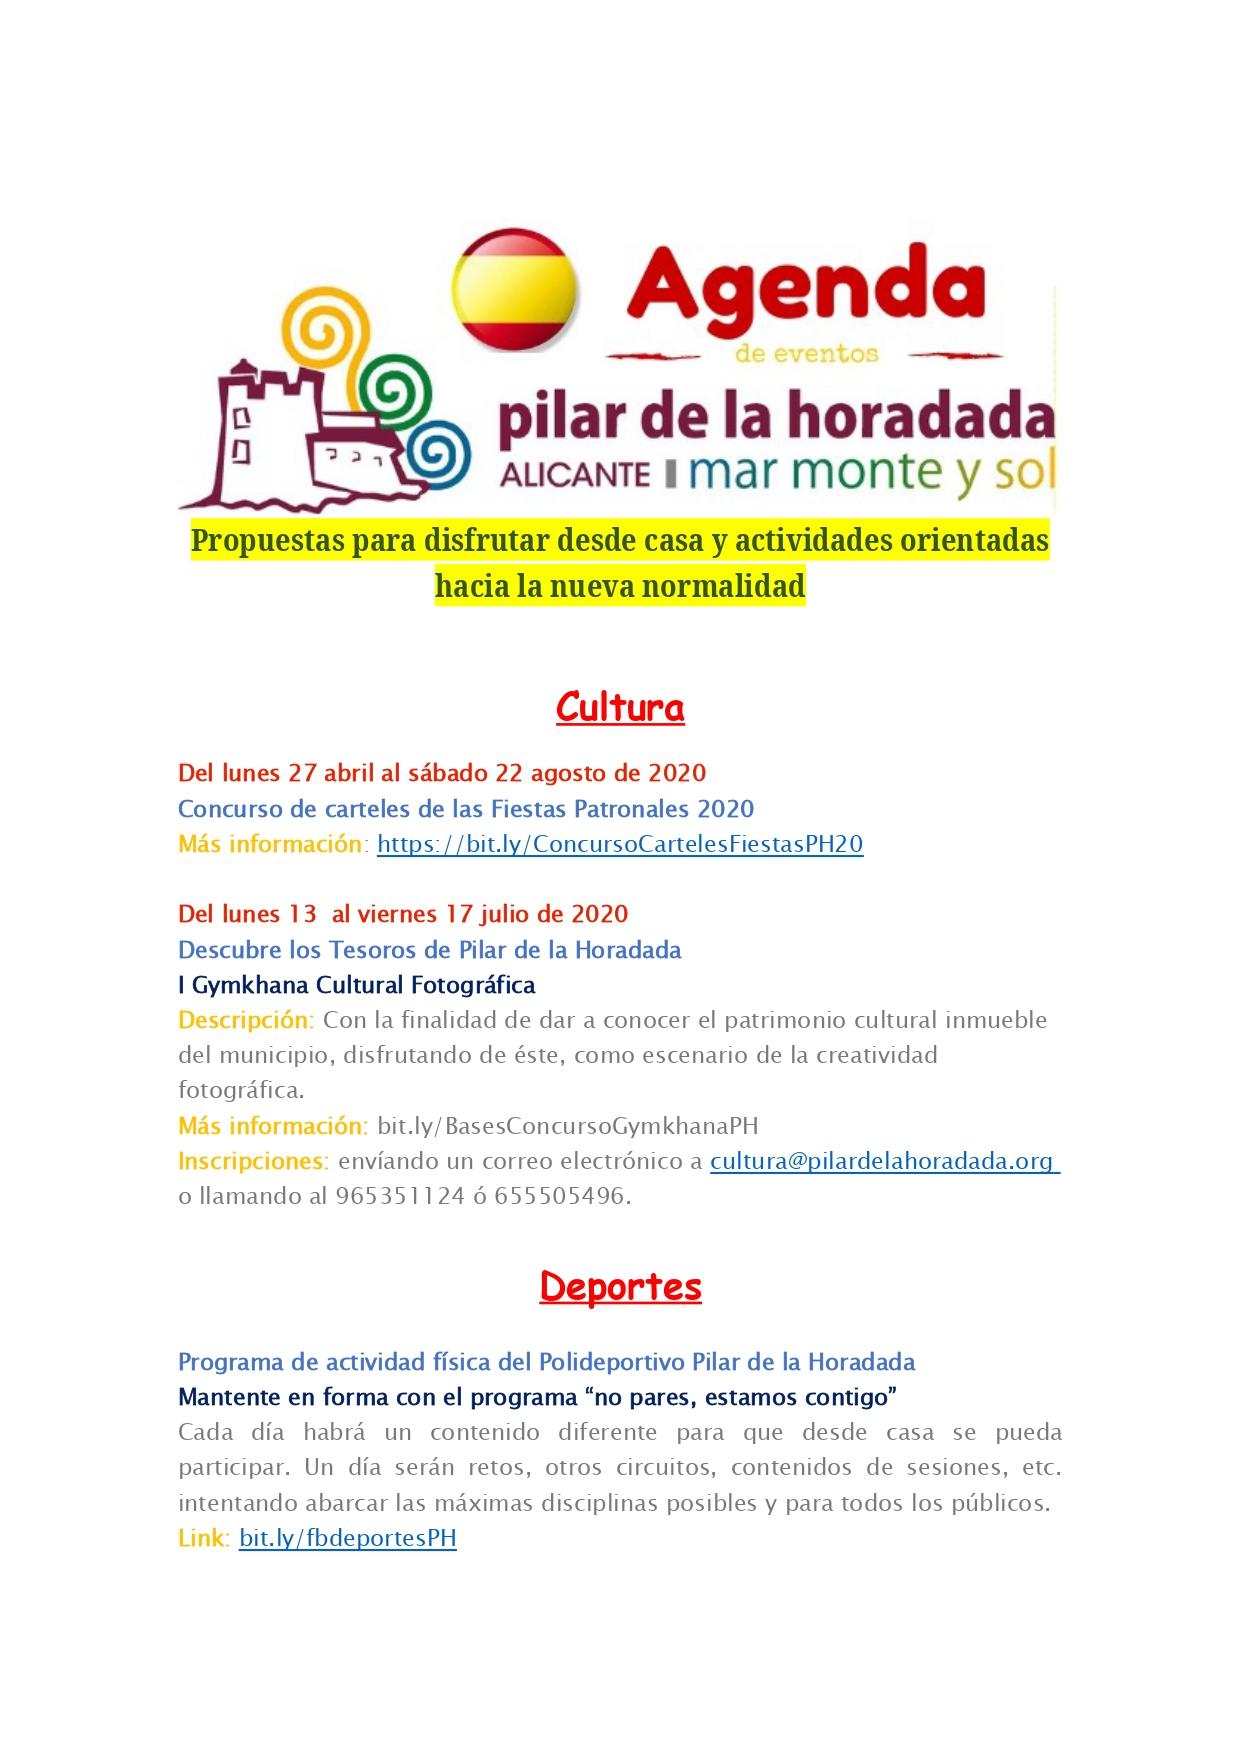 AGENDA_DE_EVENTOS_especial_PilardelaHoradadaTeEspera_25_junio_page-0001.jpg